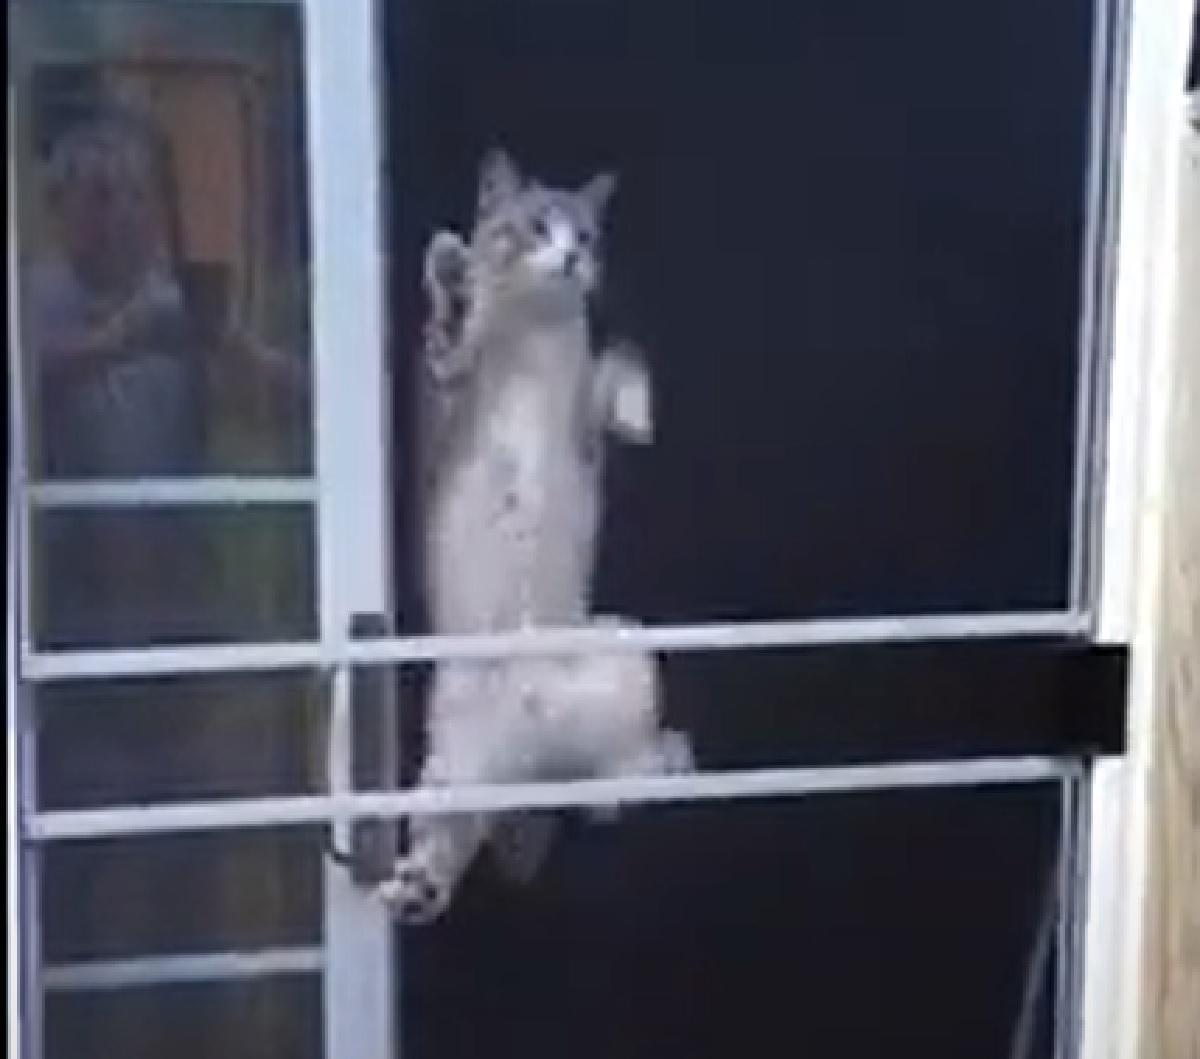 gattino ninja inizio scalata